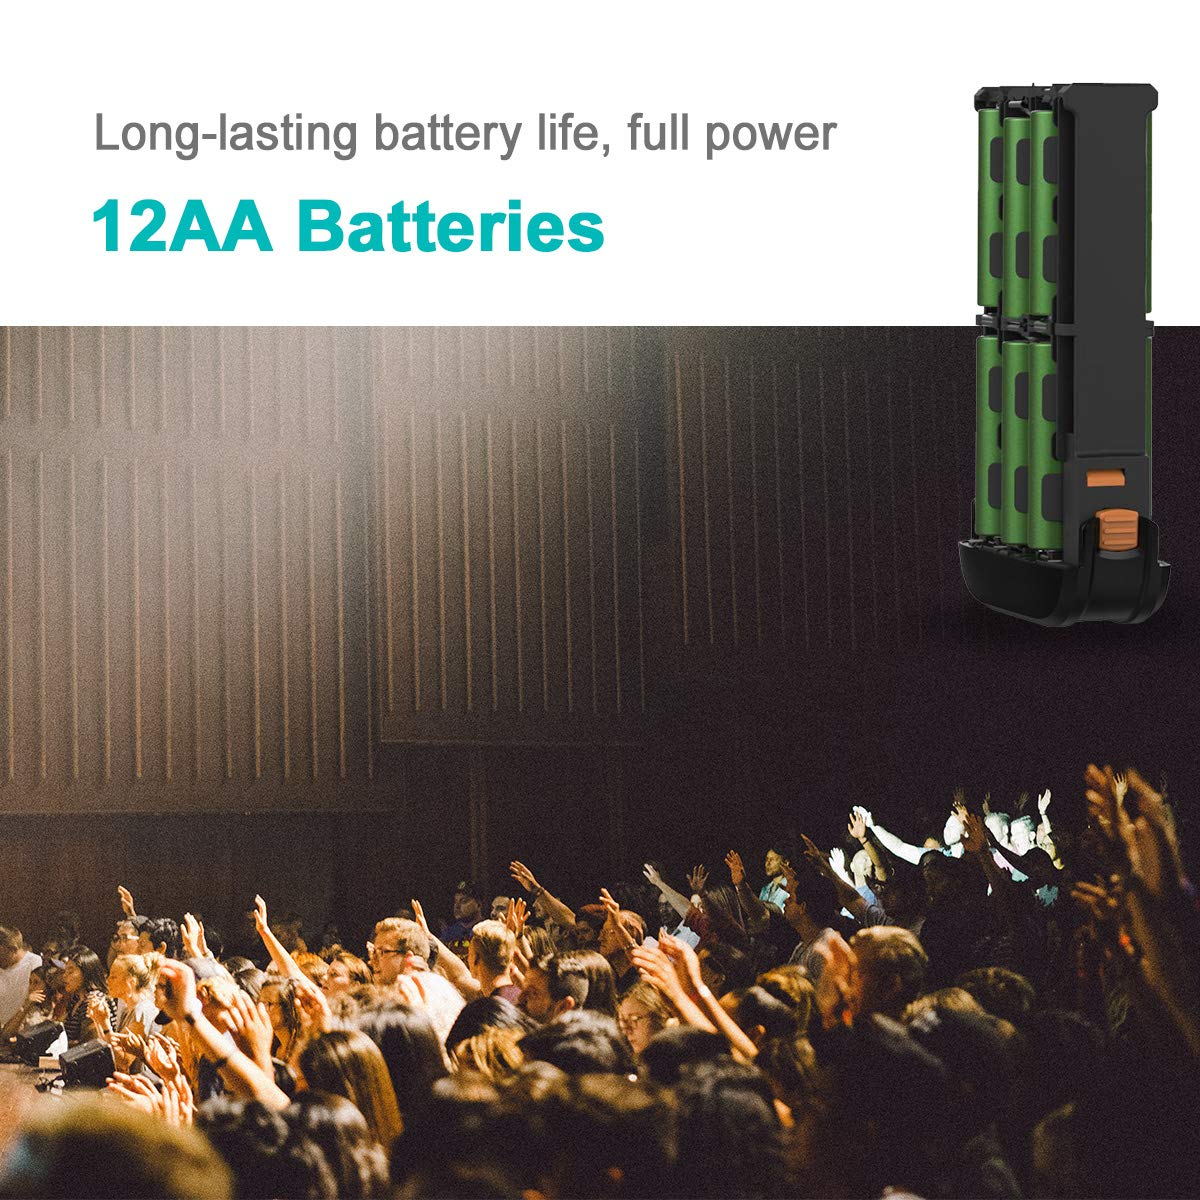 Replaces Nikon SD-9 12 AA Batteries AODELAN External Flash Battery Pack Rapid Flash Recycling Portable for Speedlite Nikon SB900 SB5000 SB910